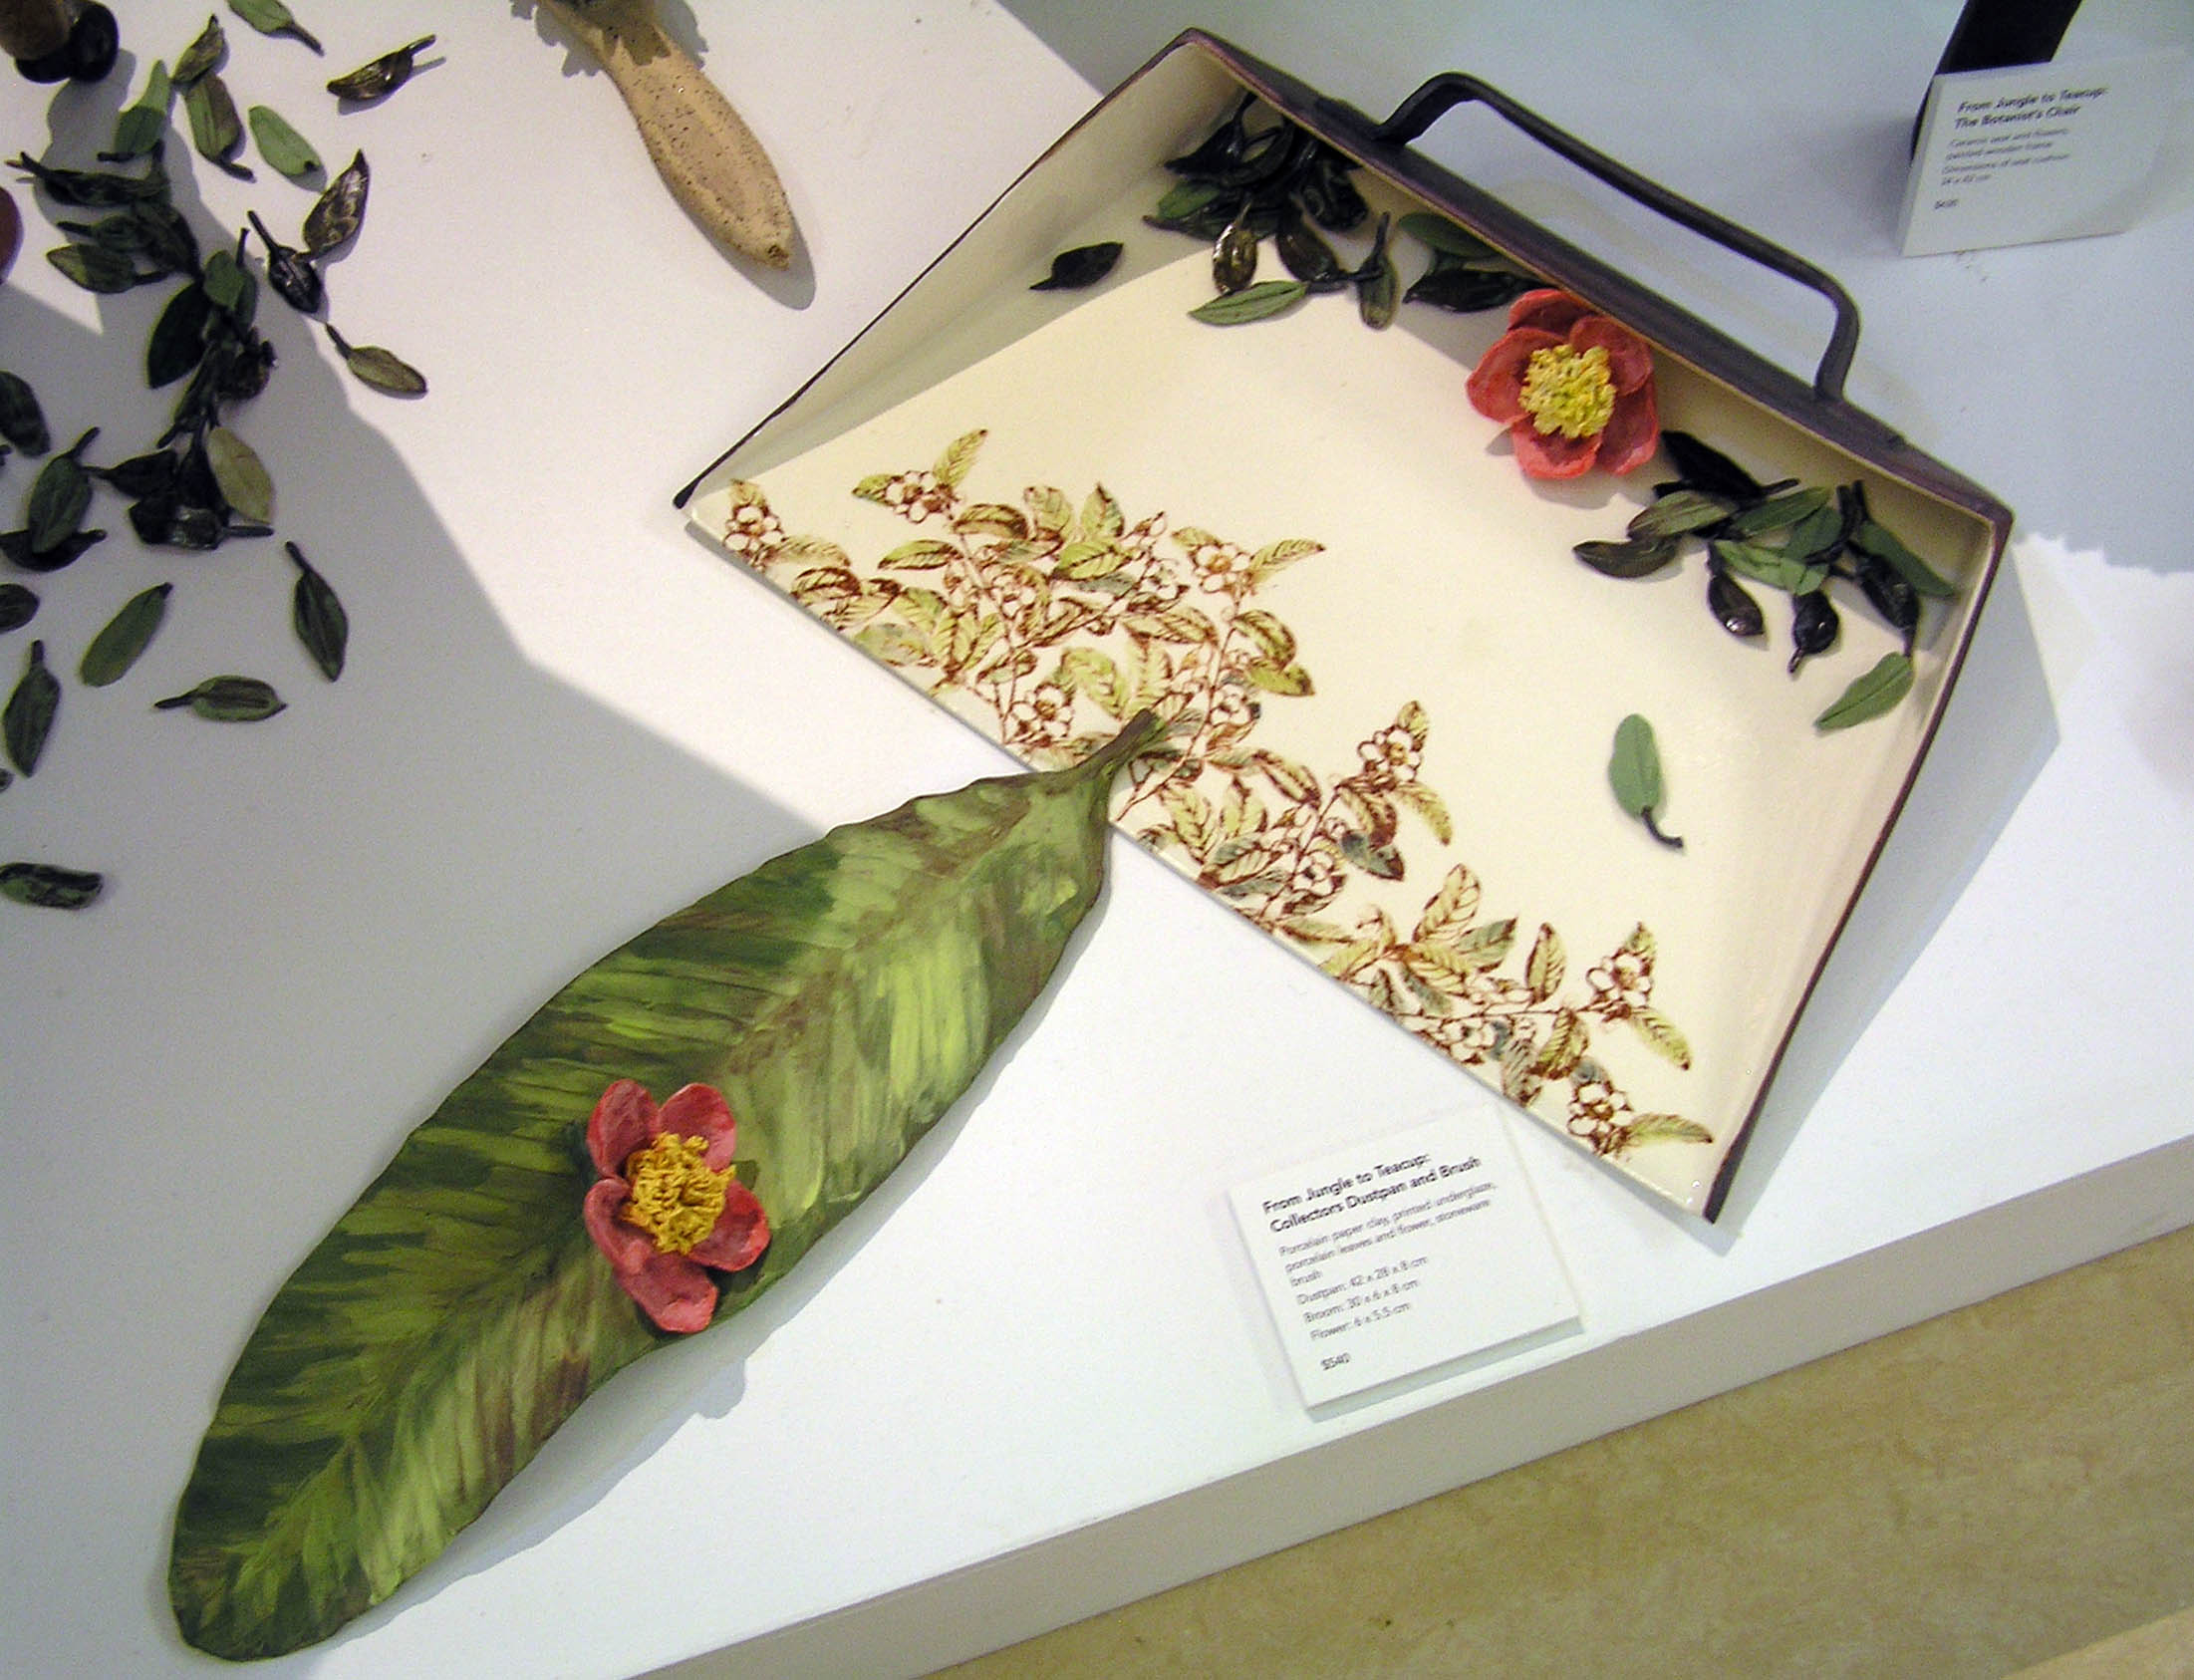 The Botanist's dustpan